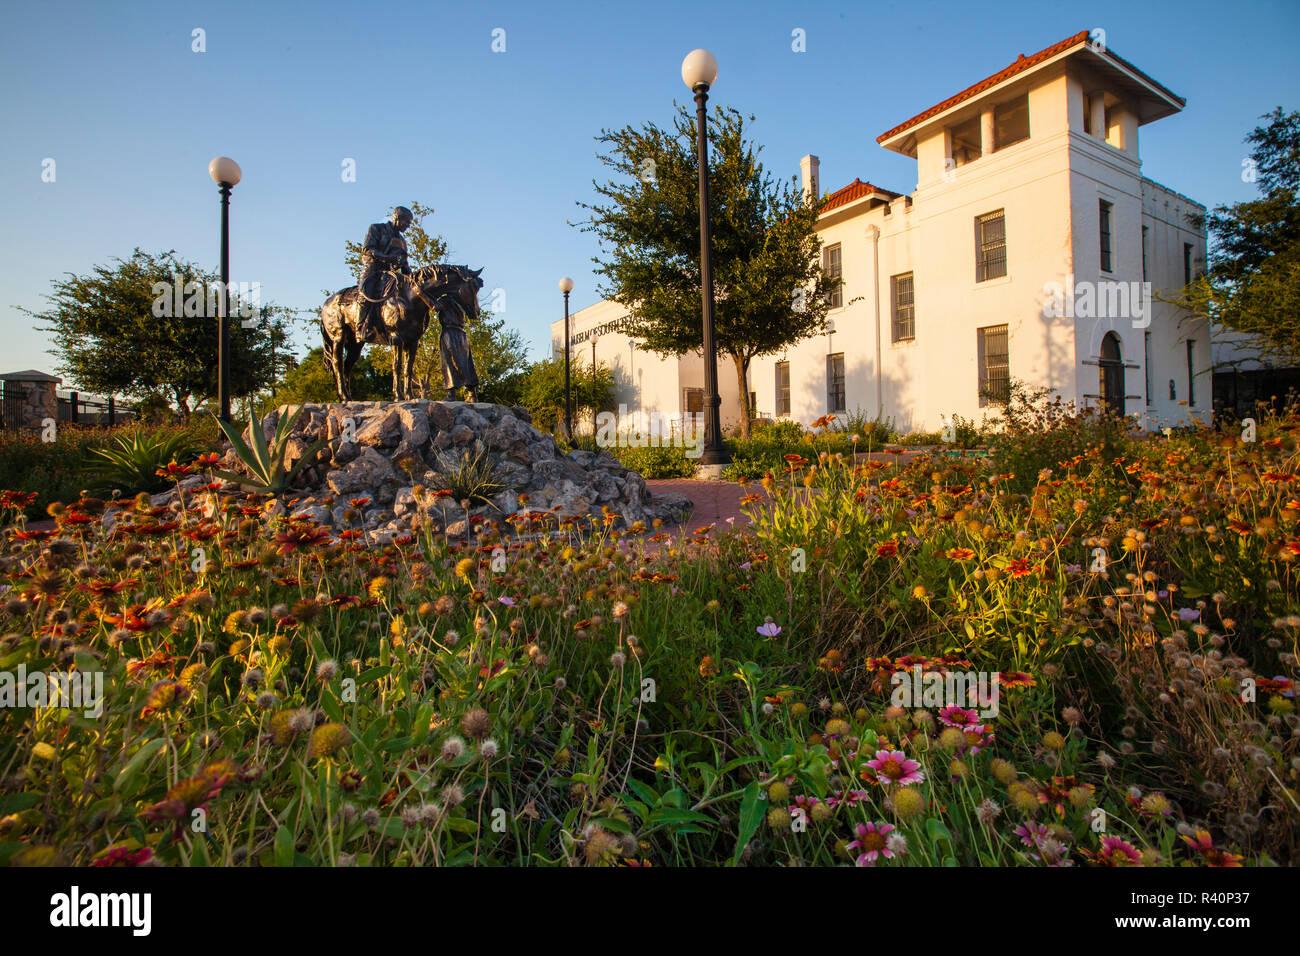 Museum of South Texas History in Edinburg, Texas. - Stock Image